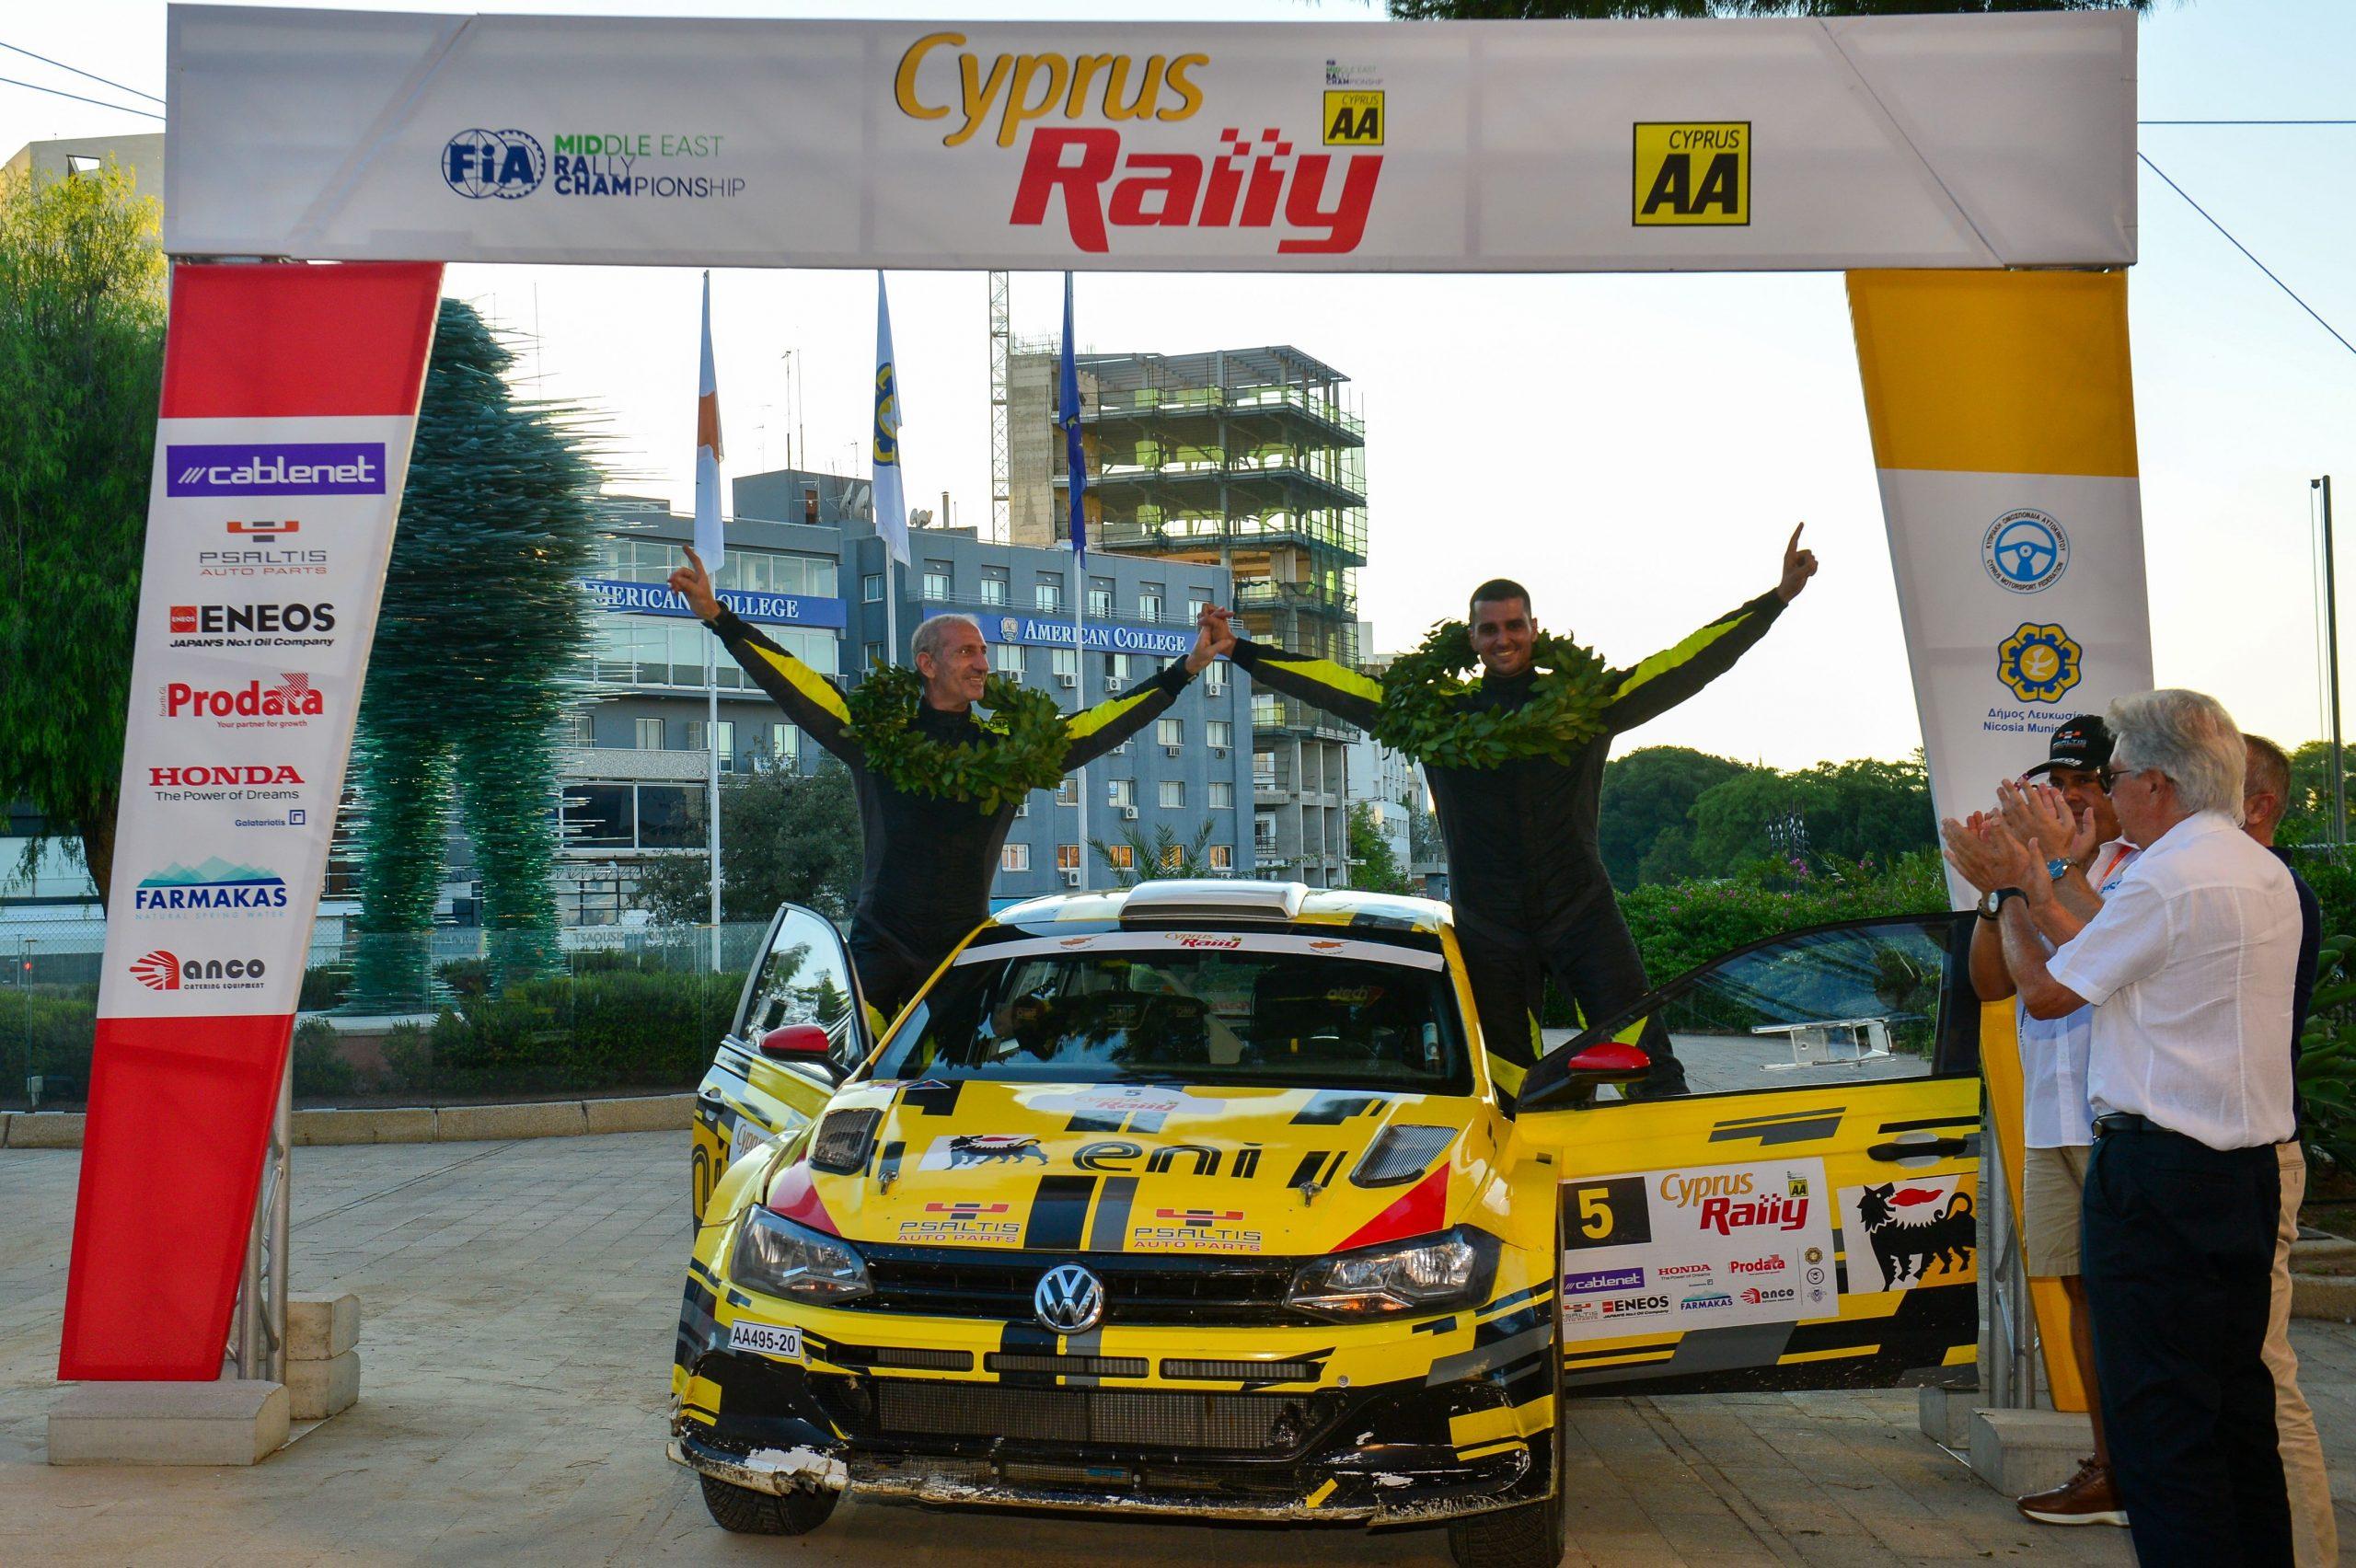 20210928_ Petrolina Cyprus Rally (1)